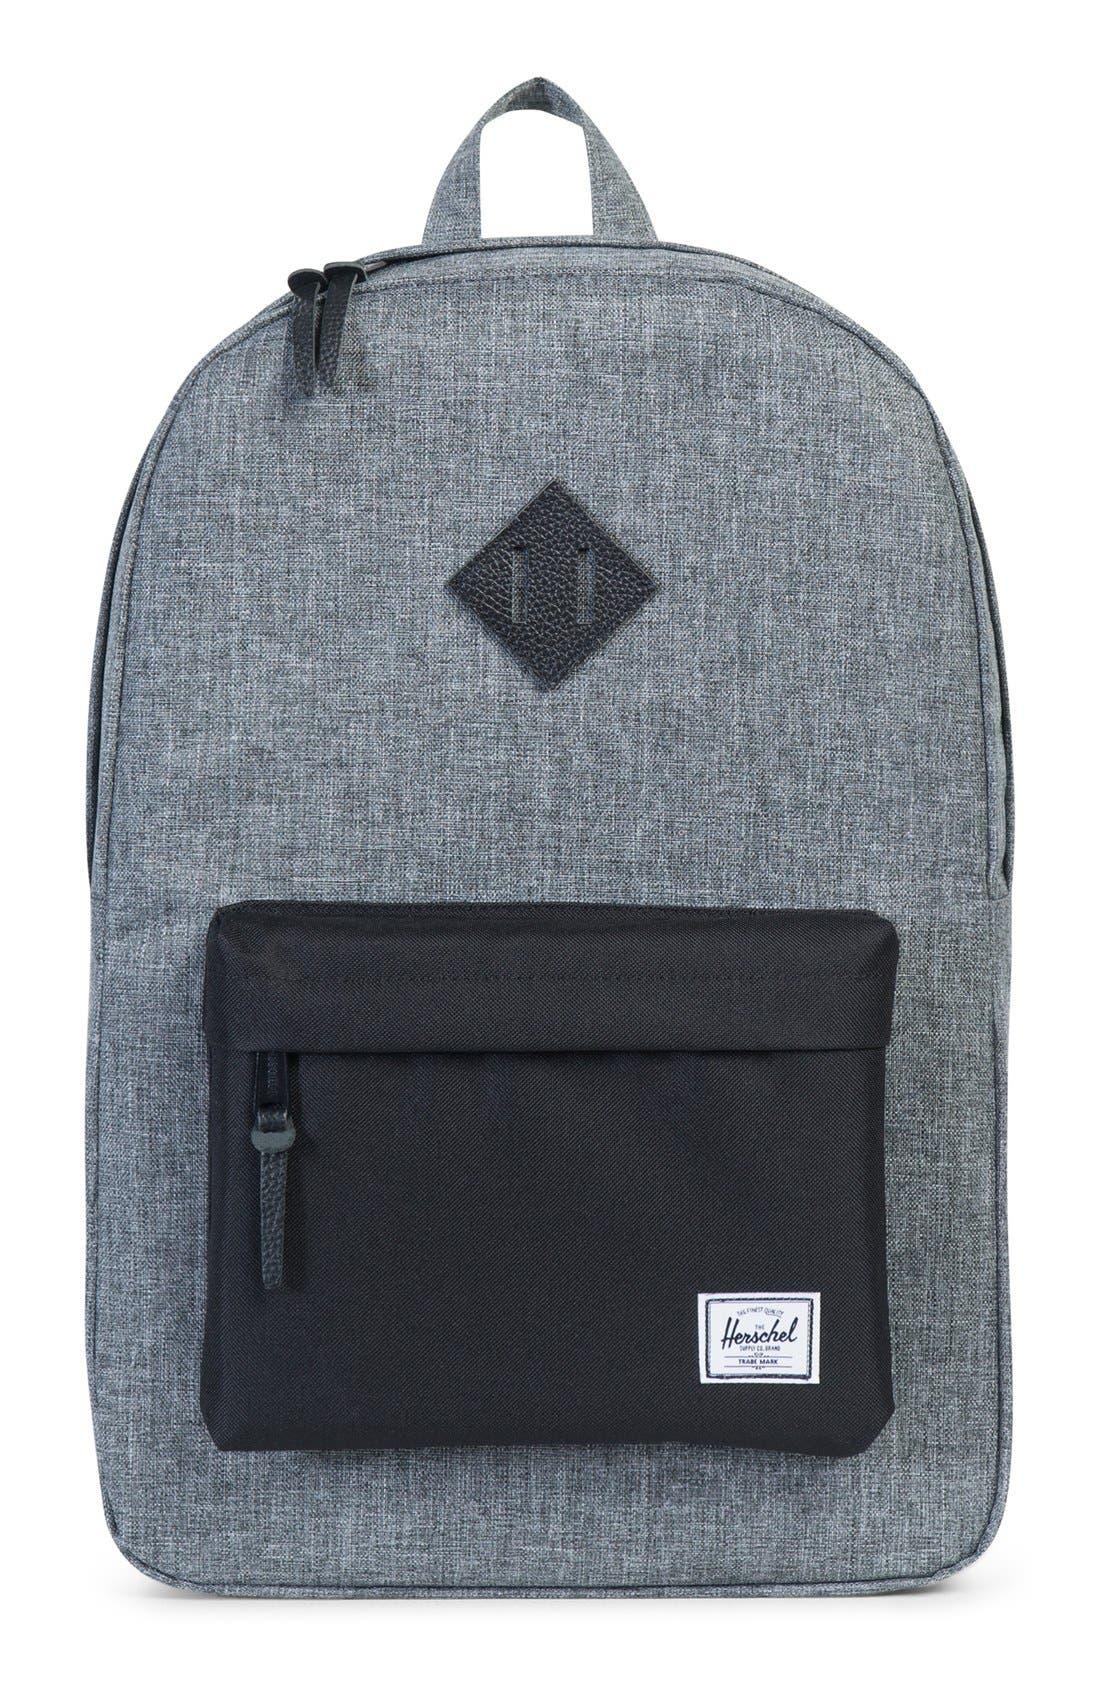 Heritage Backpack,                             Main thumbnail 1, color,                             RAVEN CROSSHATCH/ BLACK